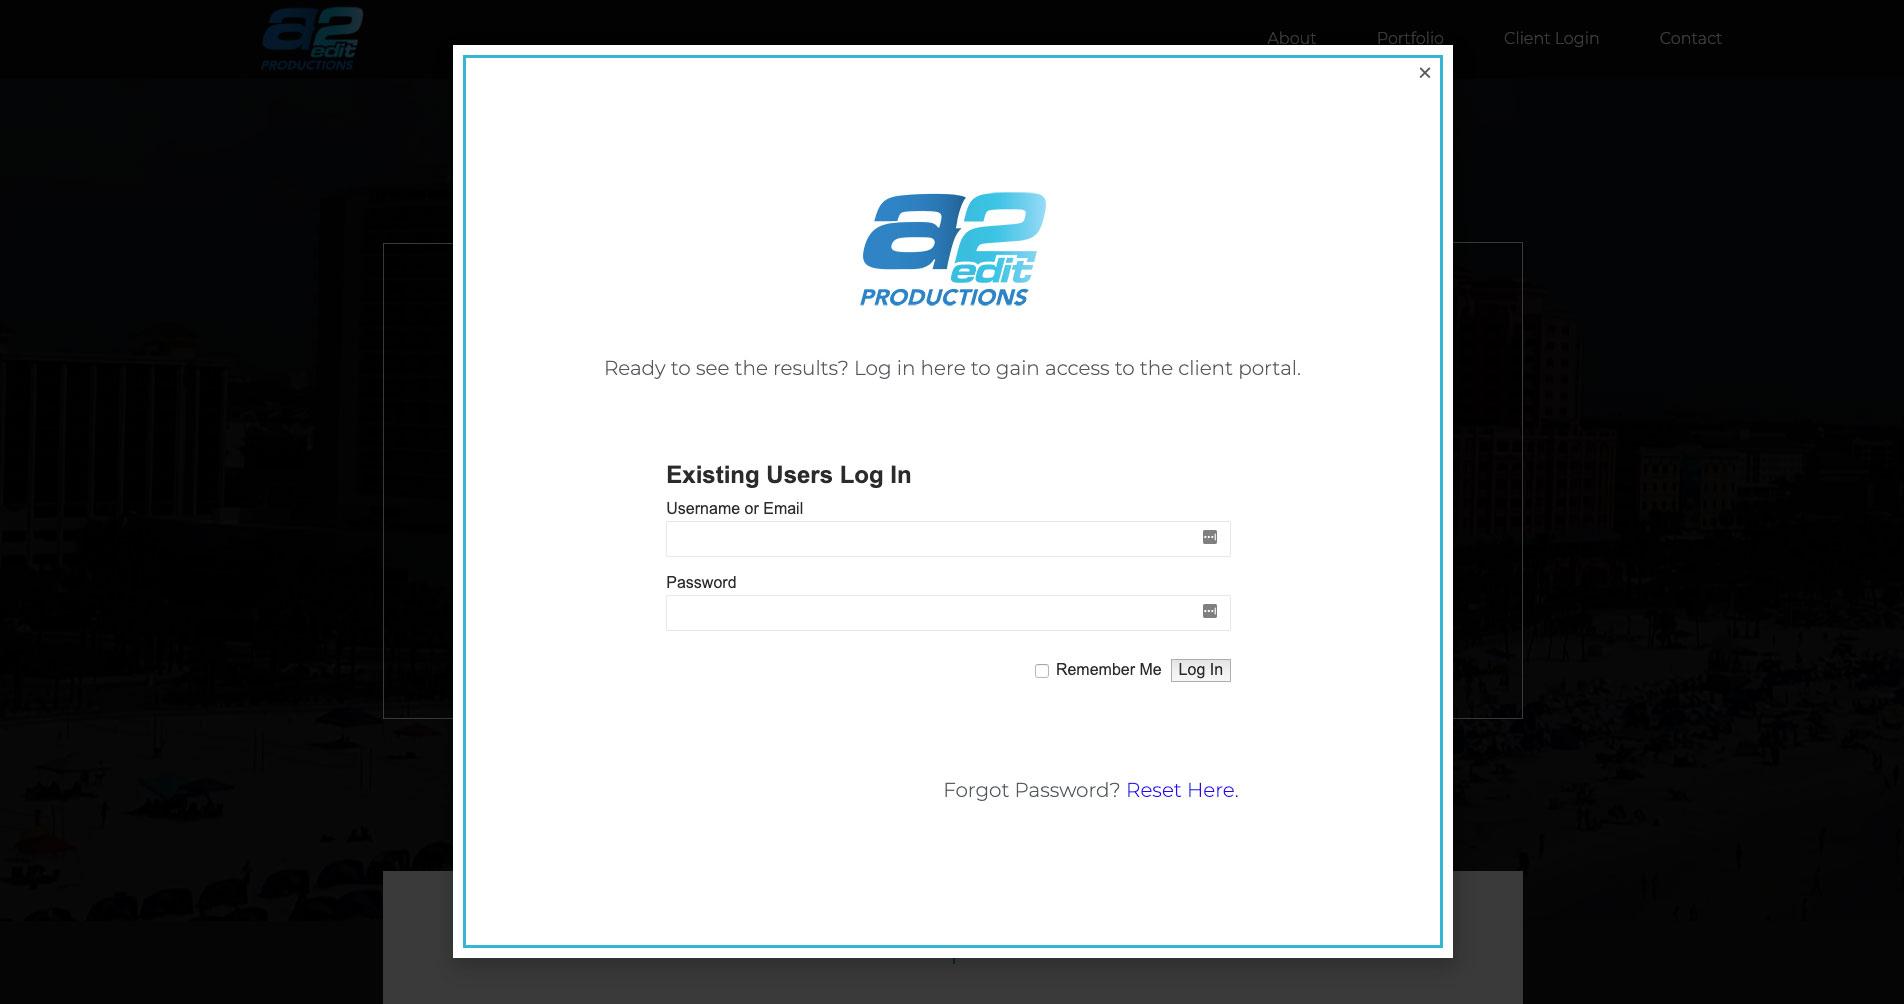 Oseeyo Web Development and Design - a2Edit client log in screen